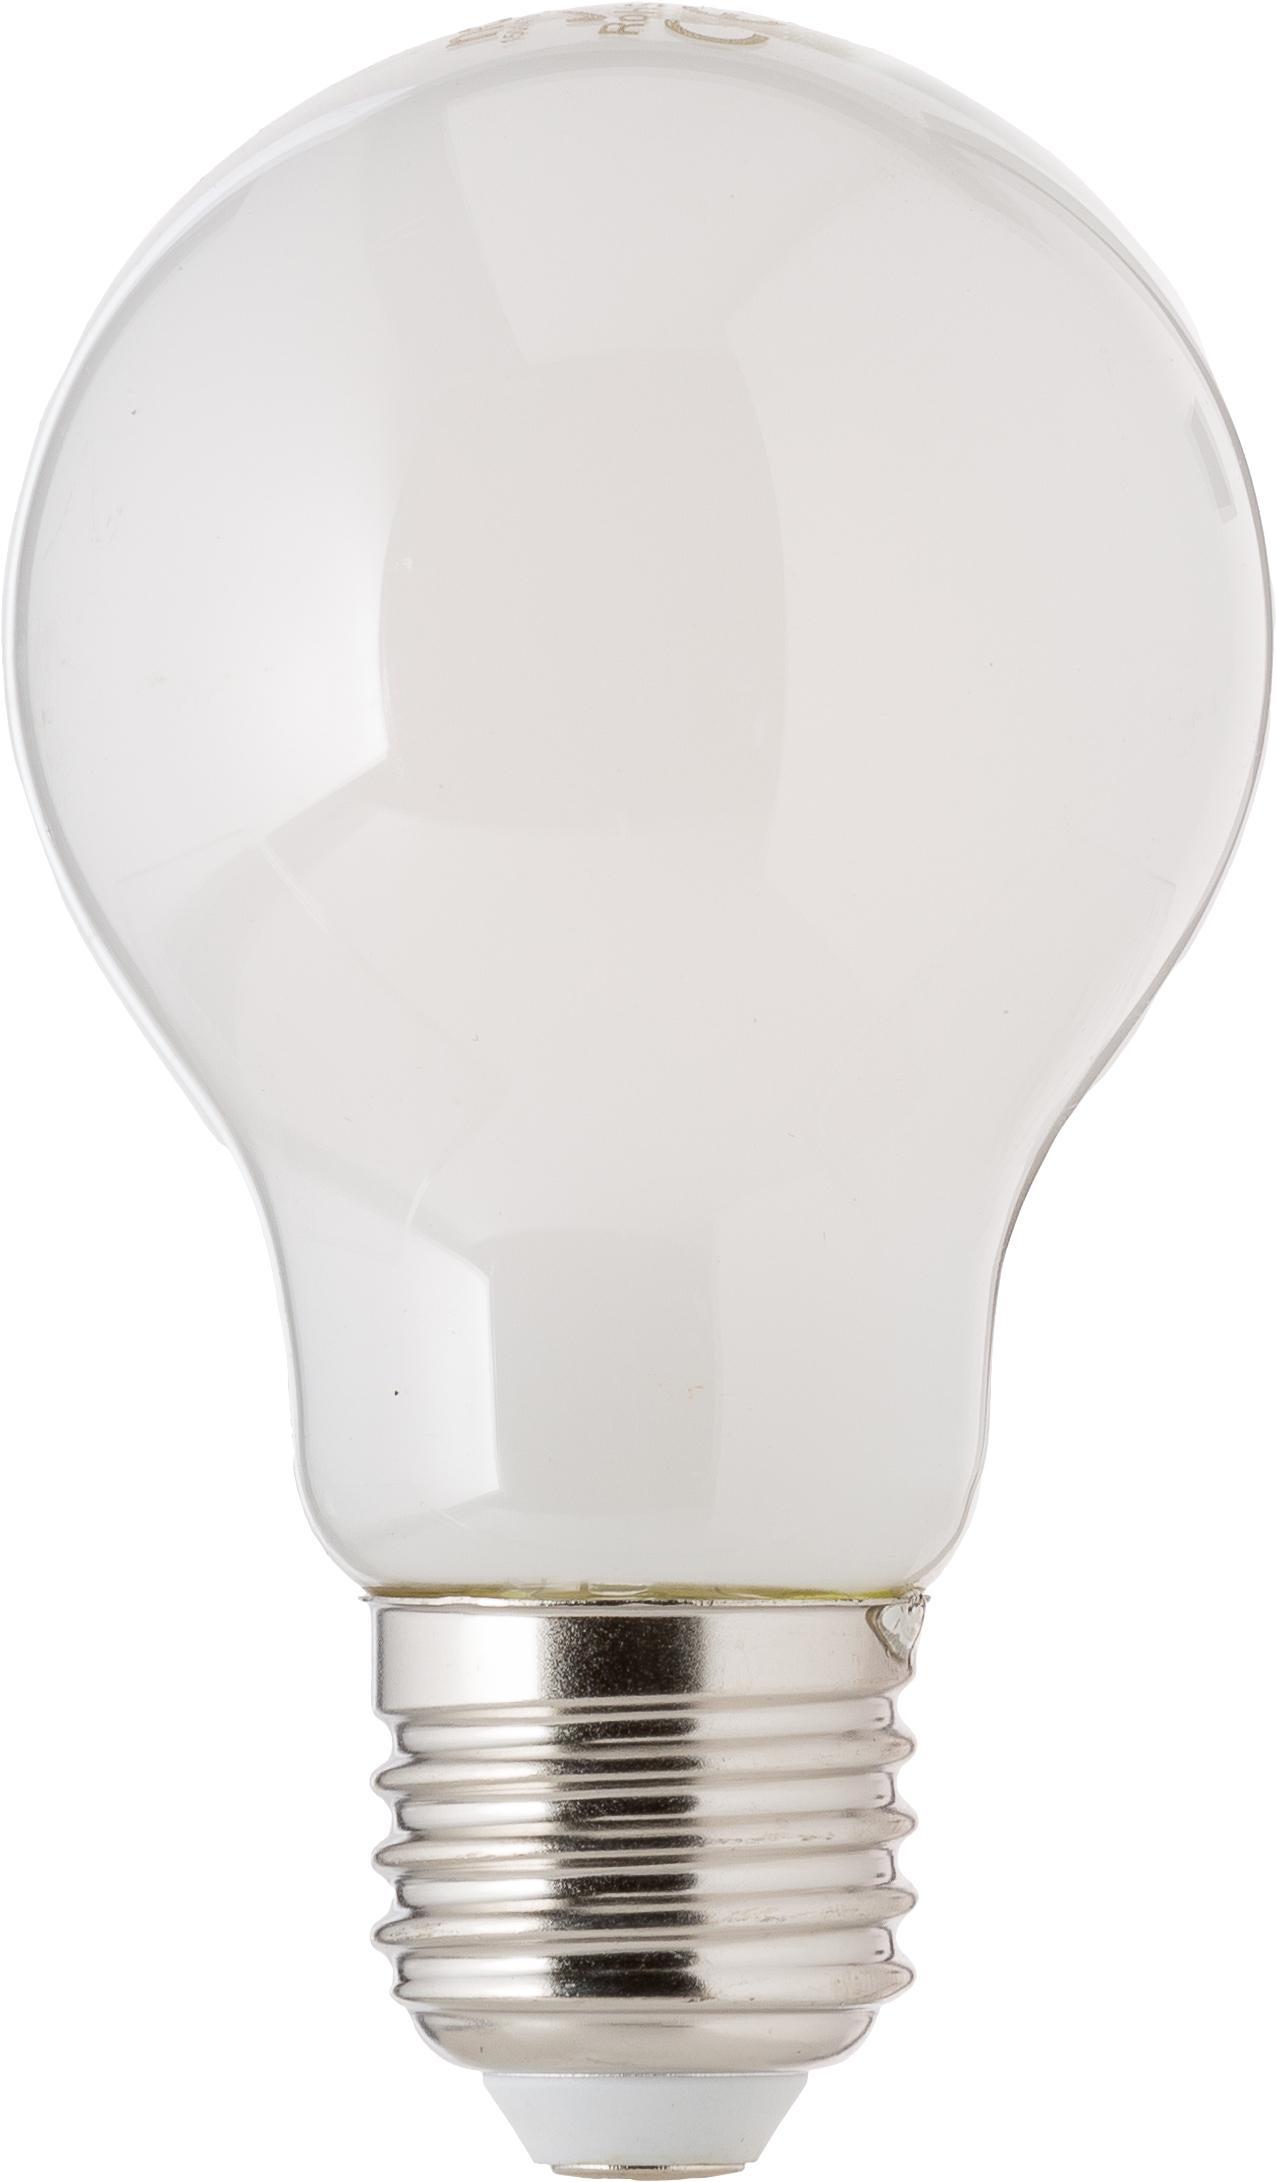 Dimmbare LED Leuchtmittel Bafa (E27/8.3W), 3 Stück, Leuchtmittelschirm: Kunststoff, Leuchtmittelfassung: Aluminium, Weiß, Ø 8 x H 10 cm